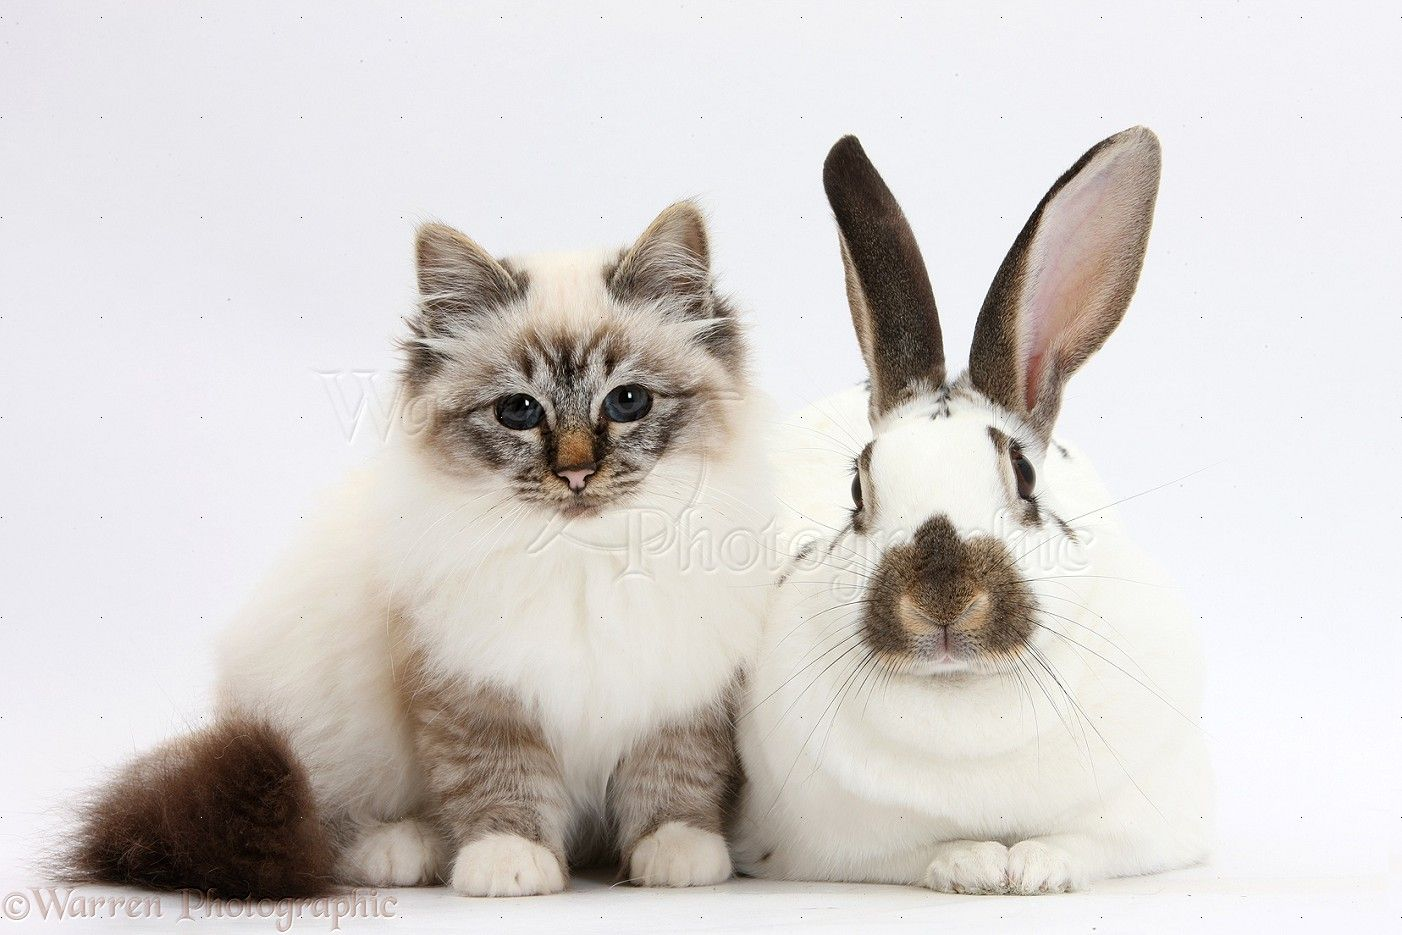 WP31959 Tabbypoint Birman cat and brownandwhite rabbit